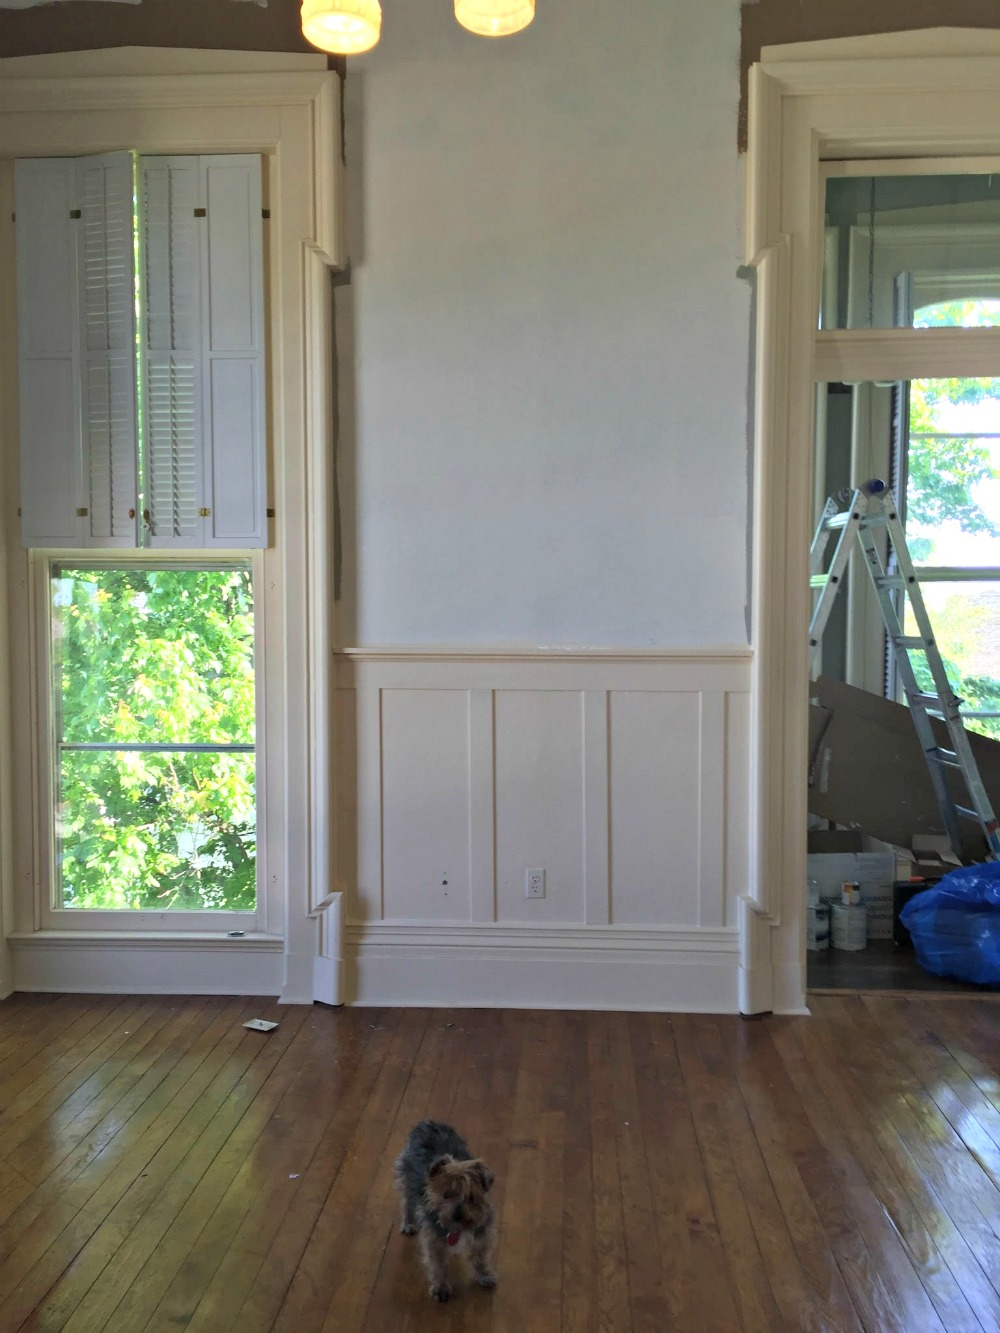 DIY Board and Batten with Hot Glue - Rachel Teodoro